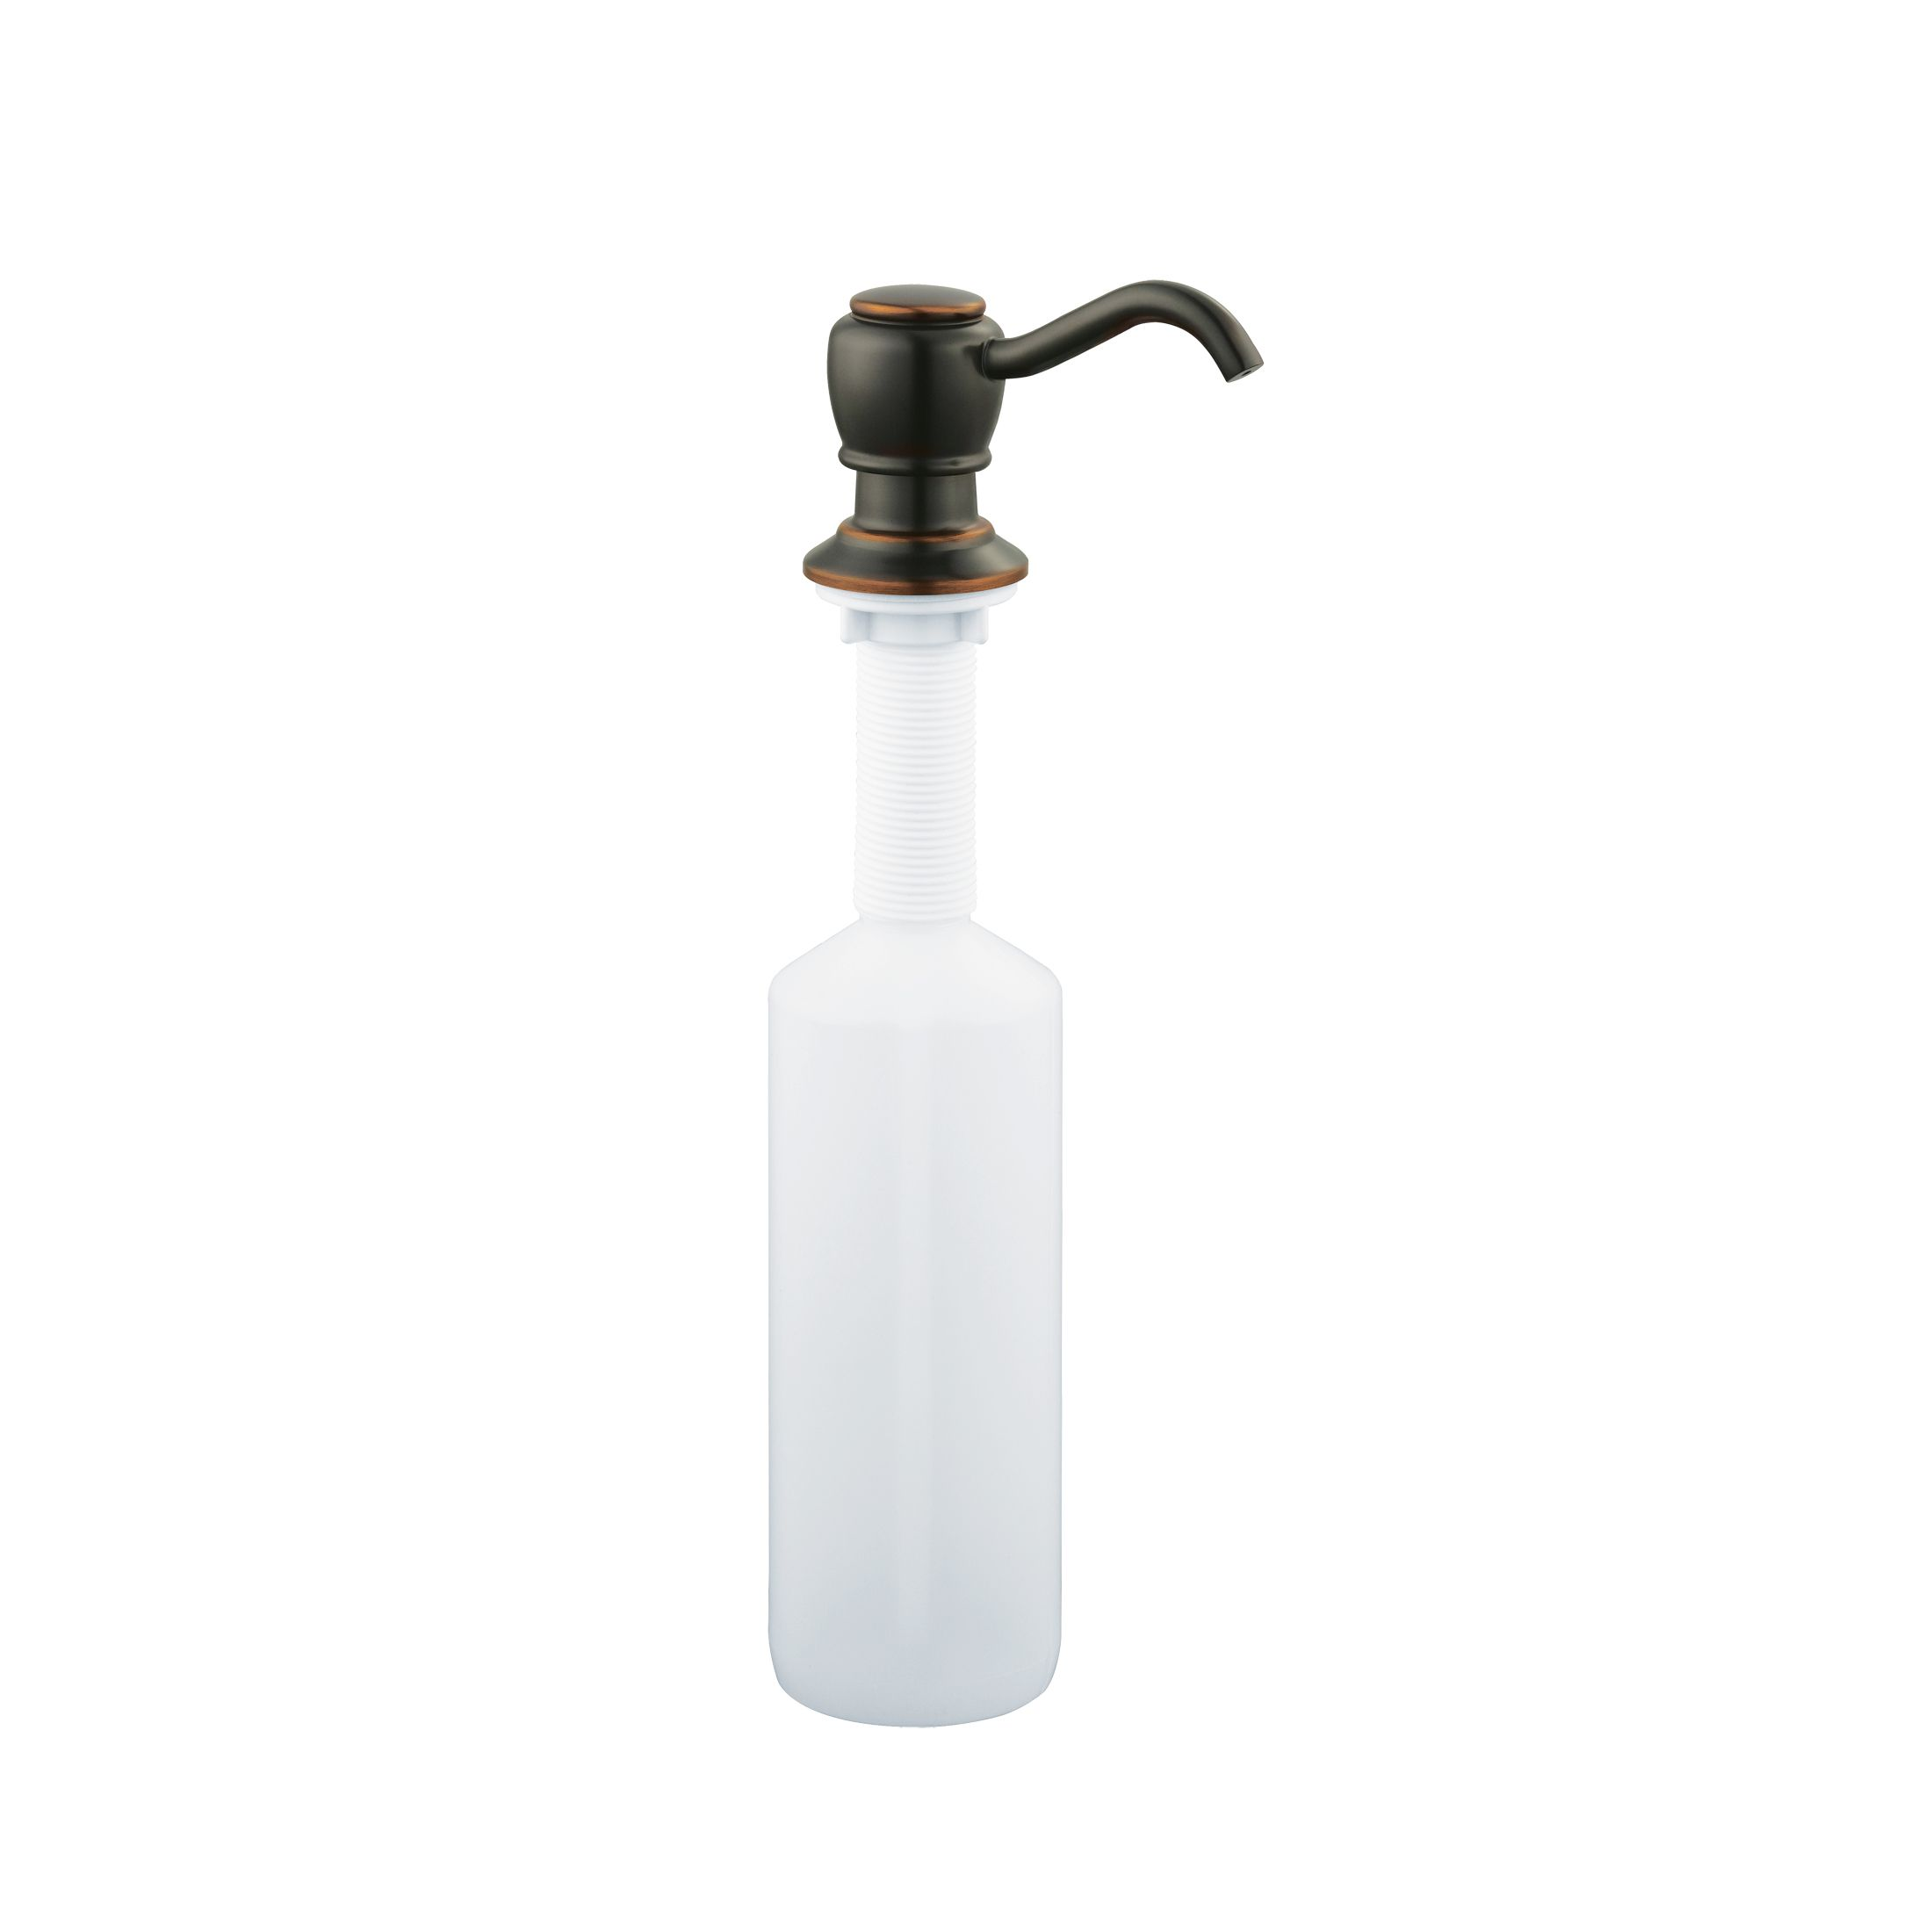 Soap Dispenser in Oil Rubbed Bronze #522268